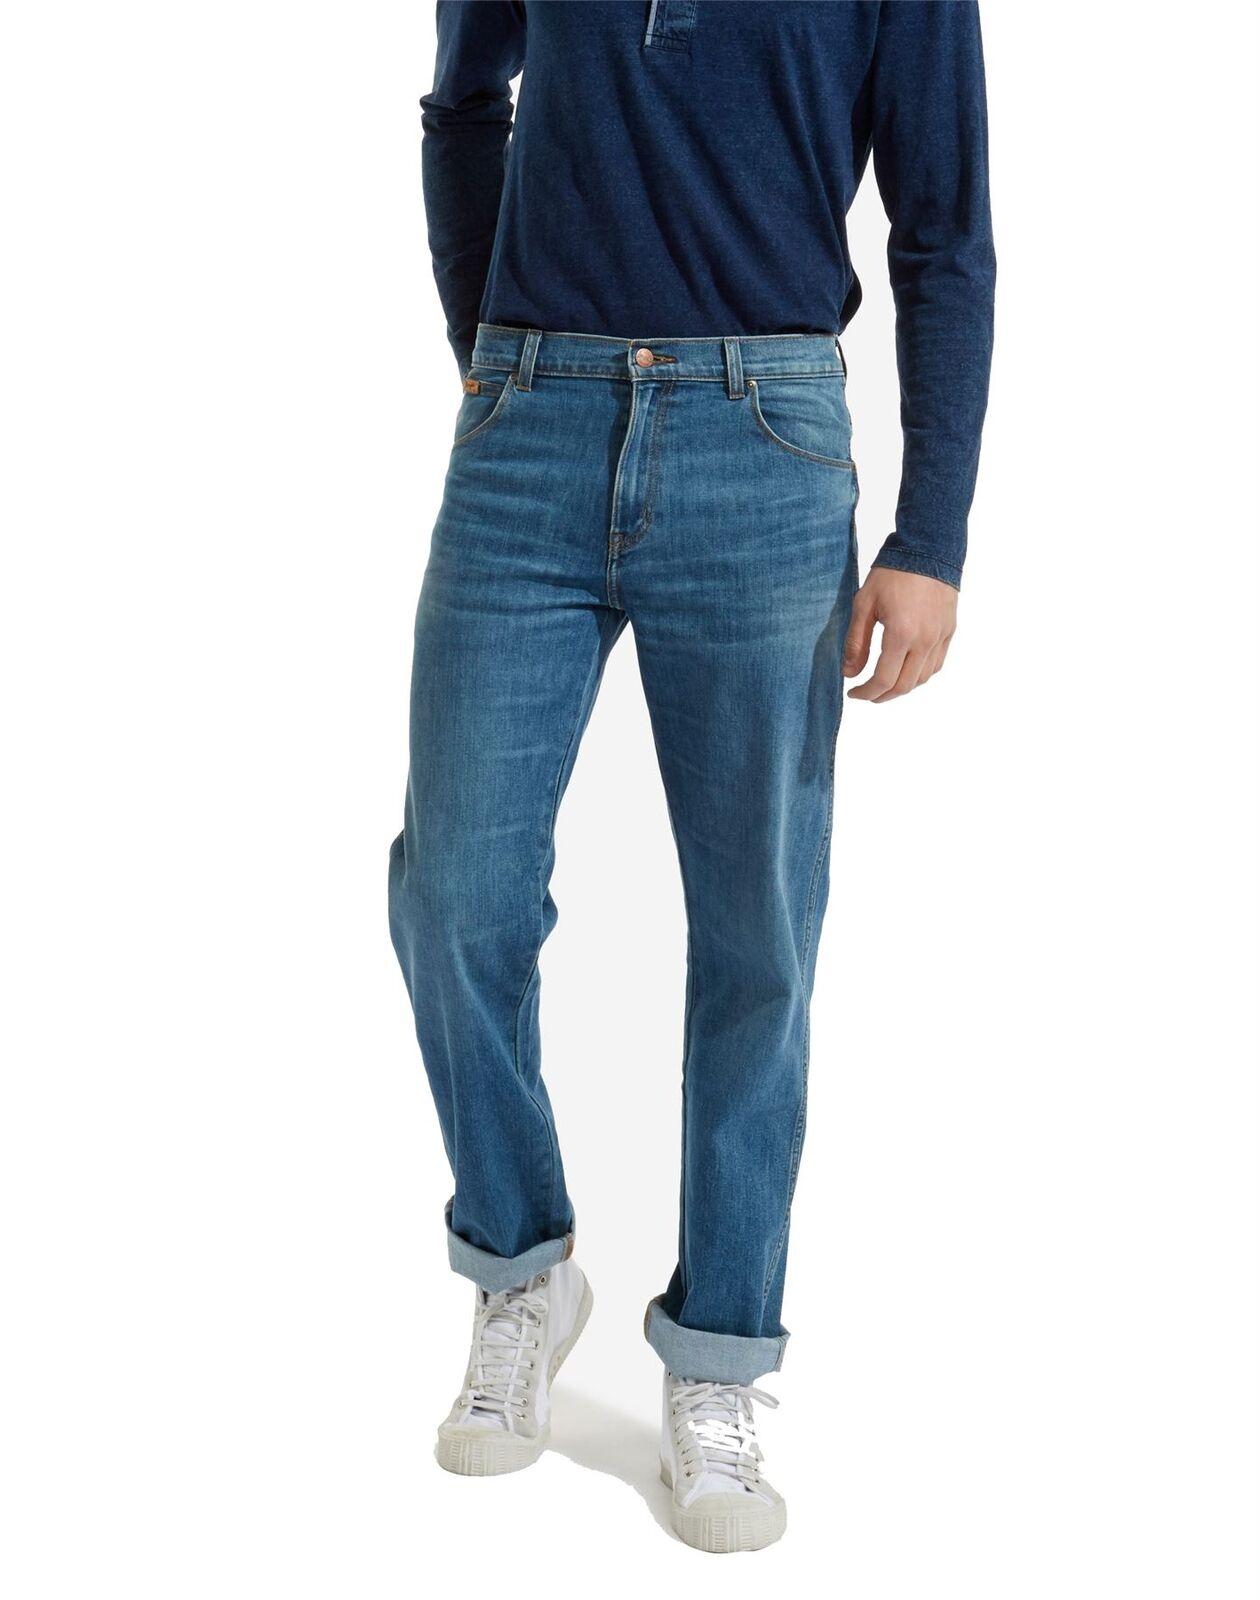 Wrangelr Mens Texas Stretch Volcano Thermolite Jeans